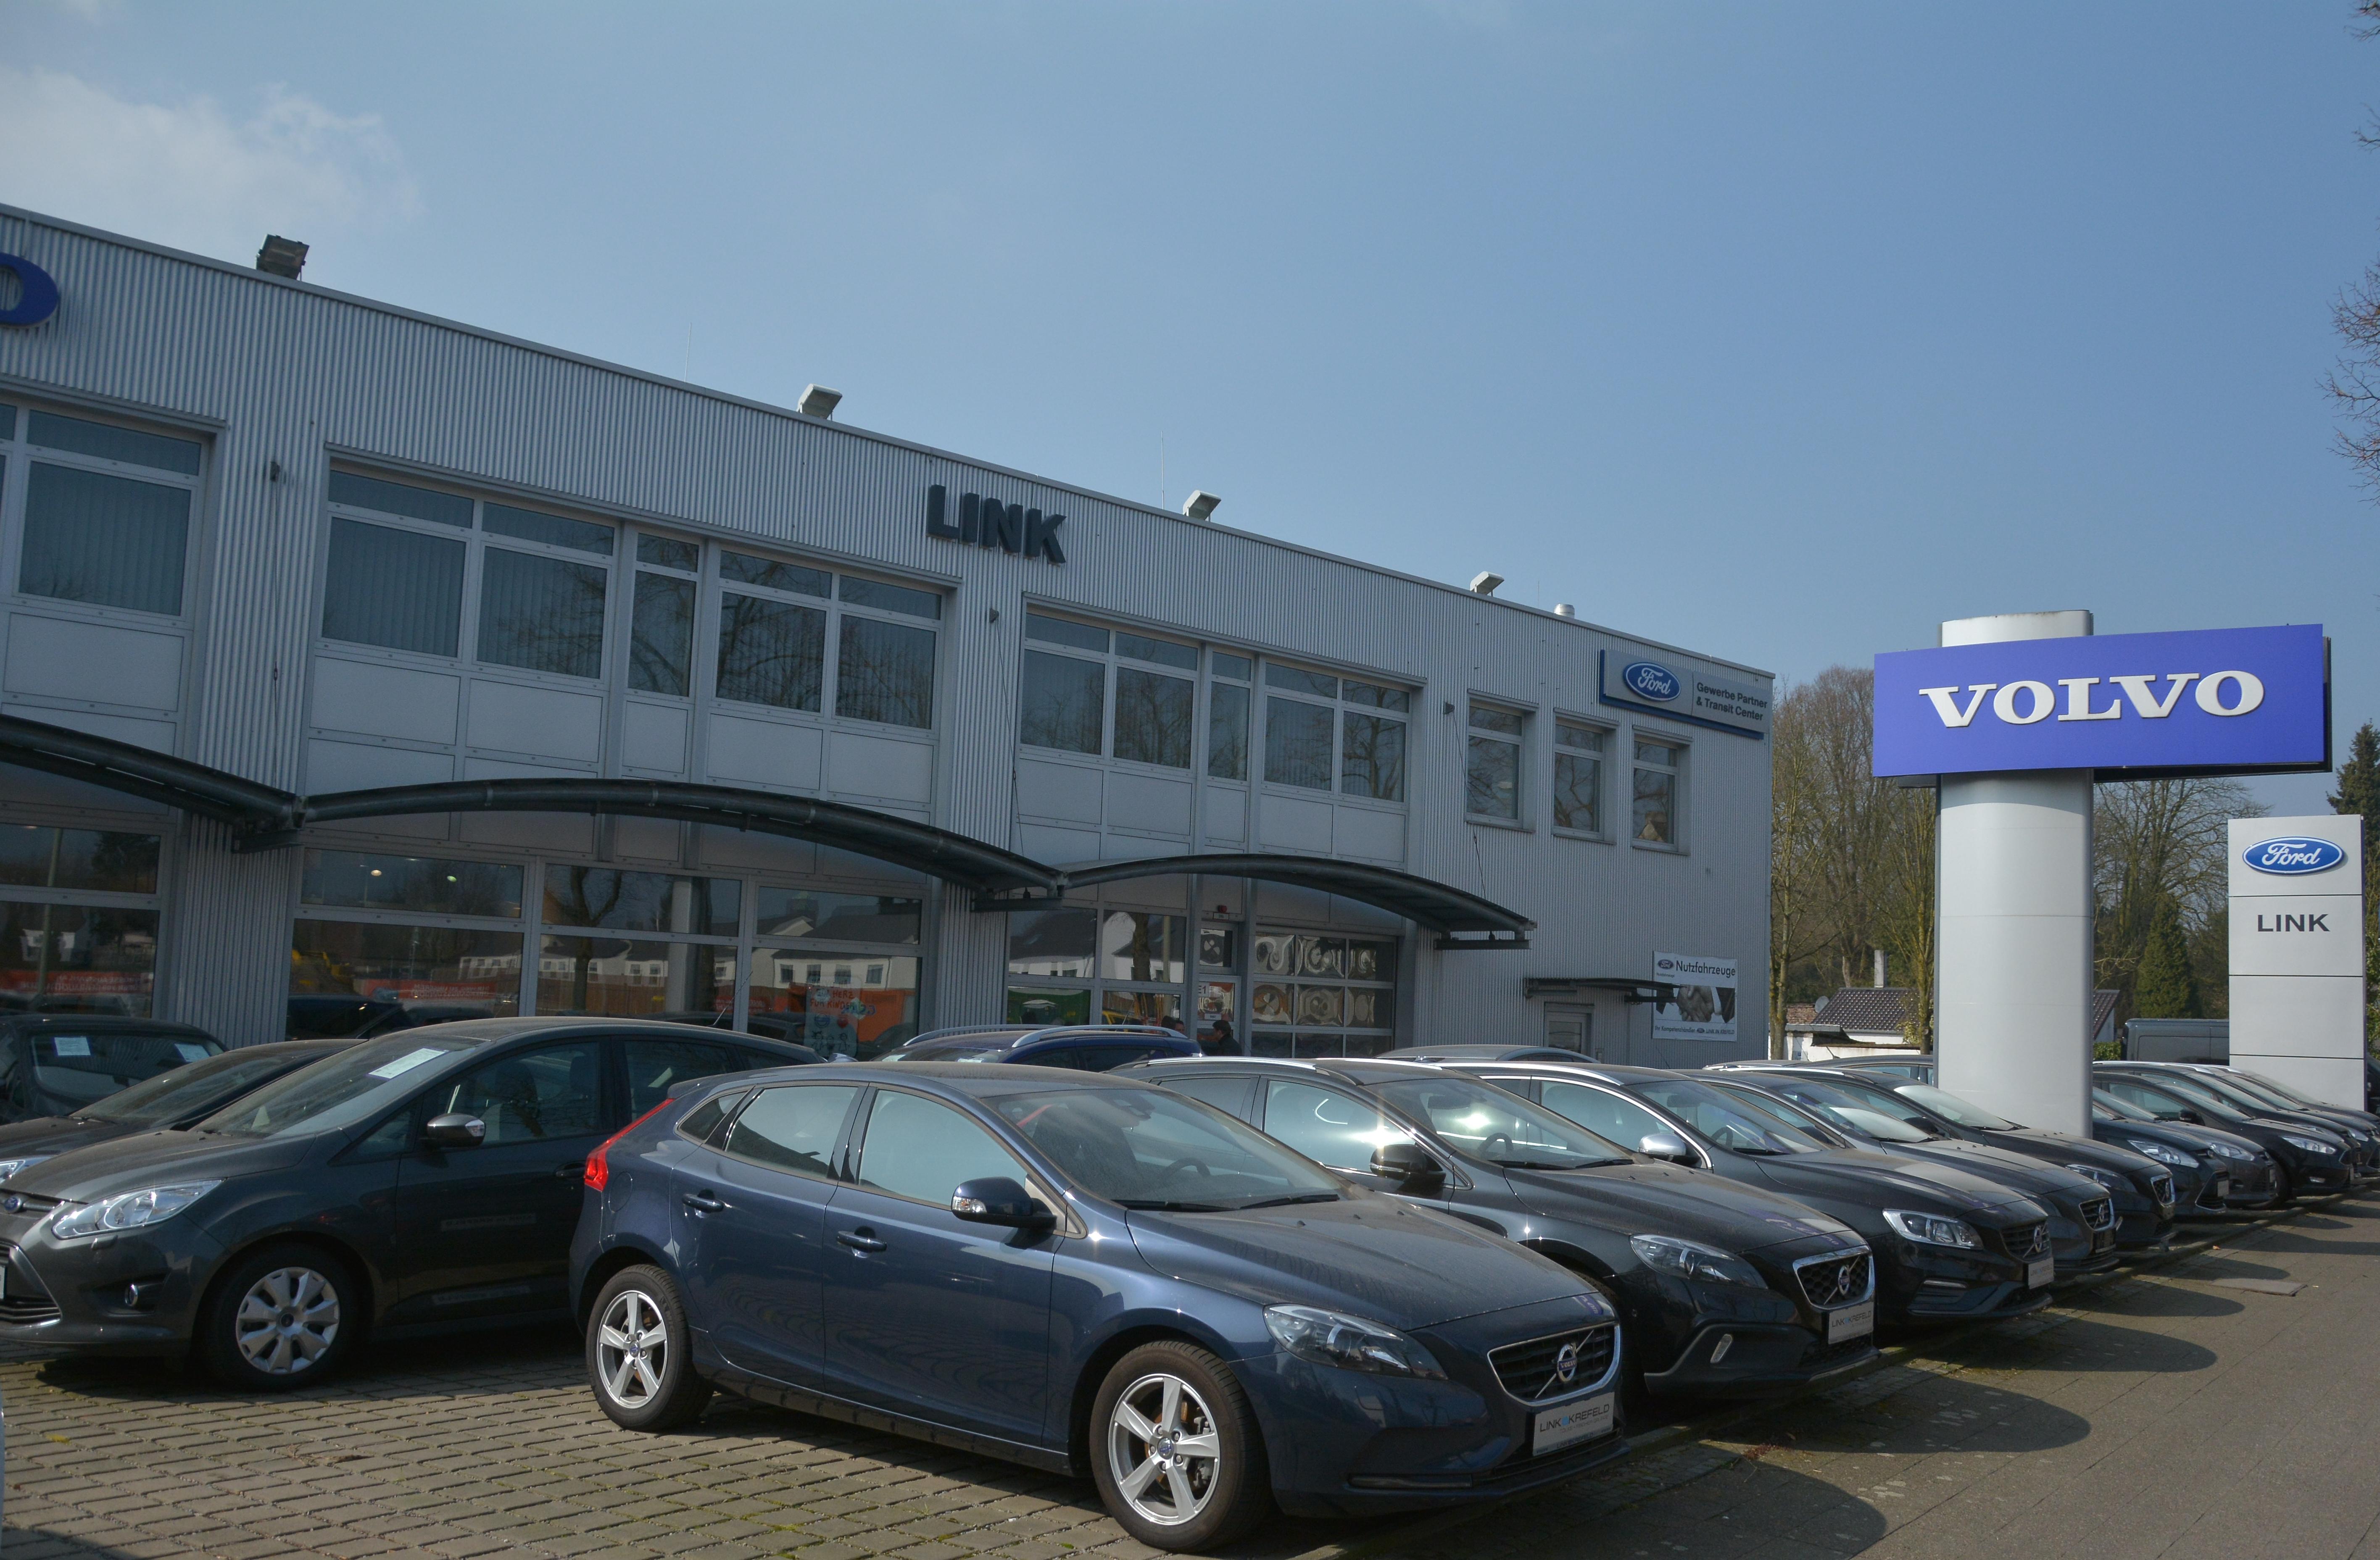 Volvo Autohaus Link